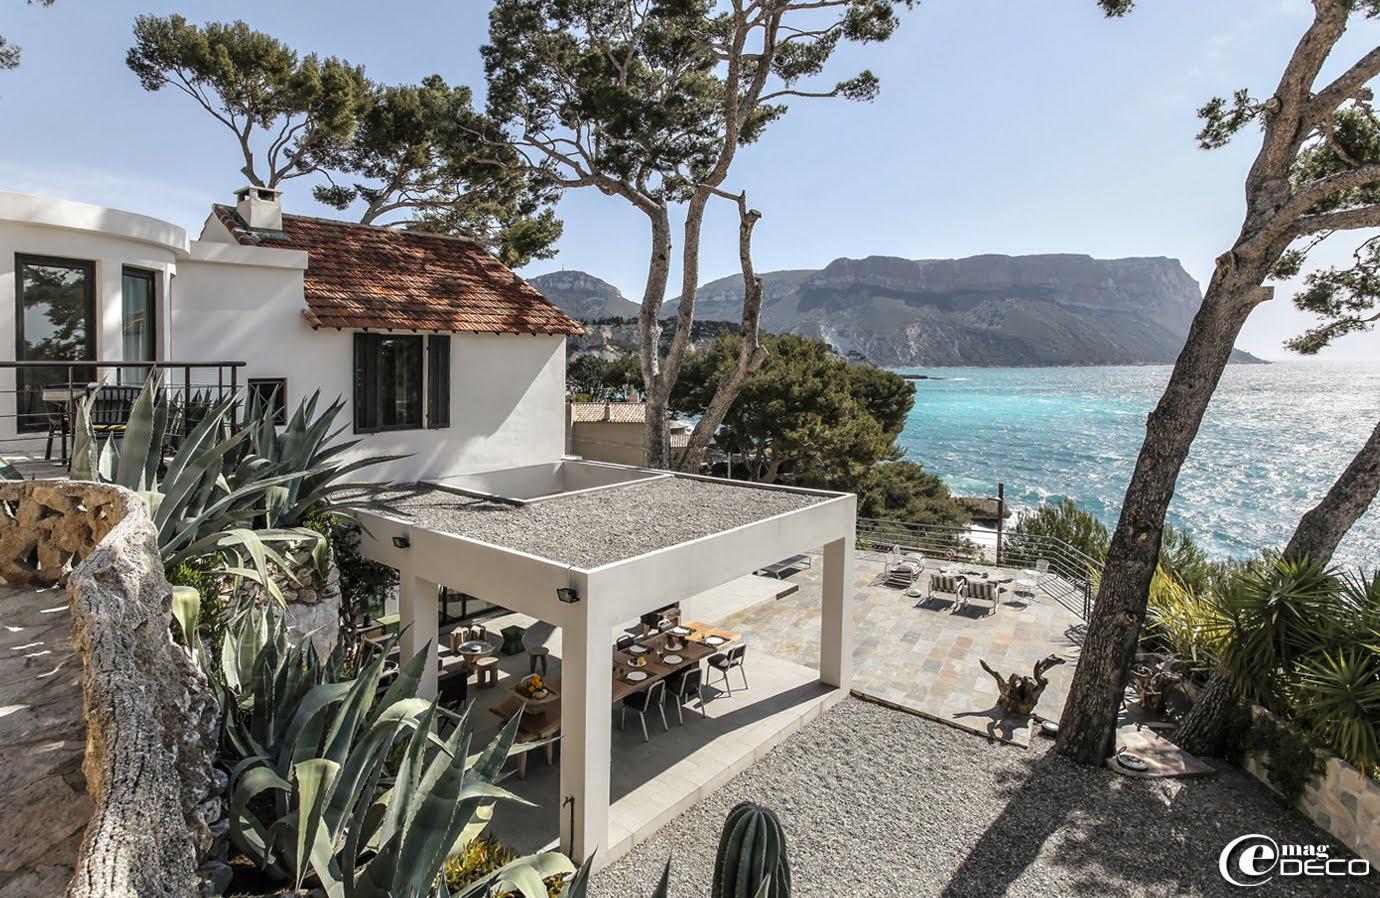 plan de maison mediterranee gratuit. Black Bedroom Furniture Sets. Home Design Ideas